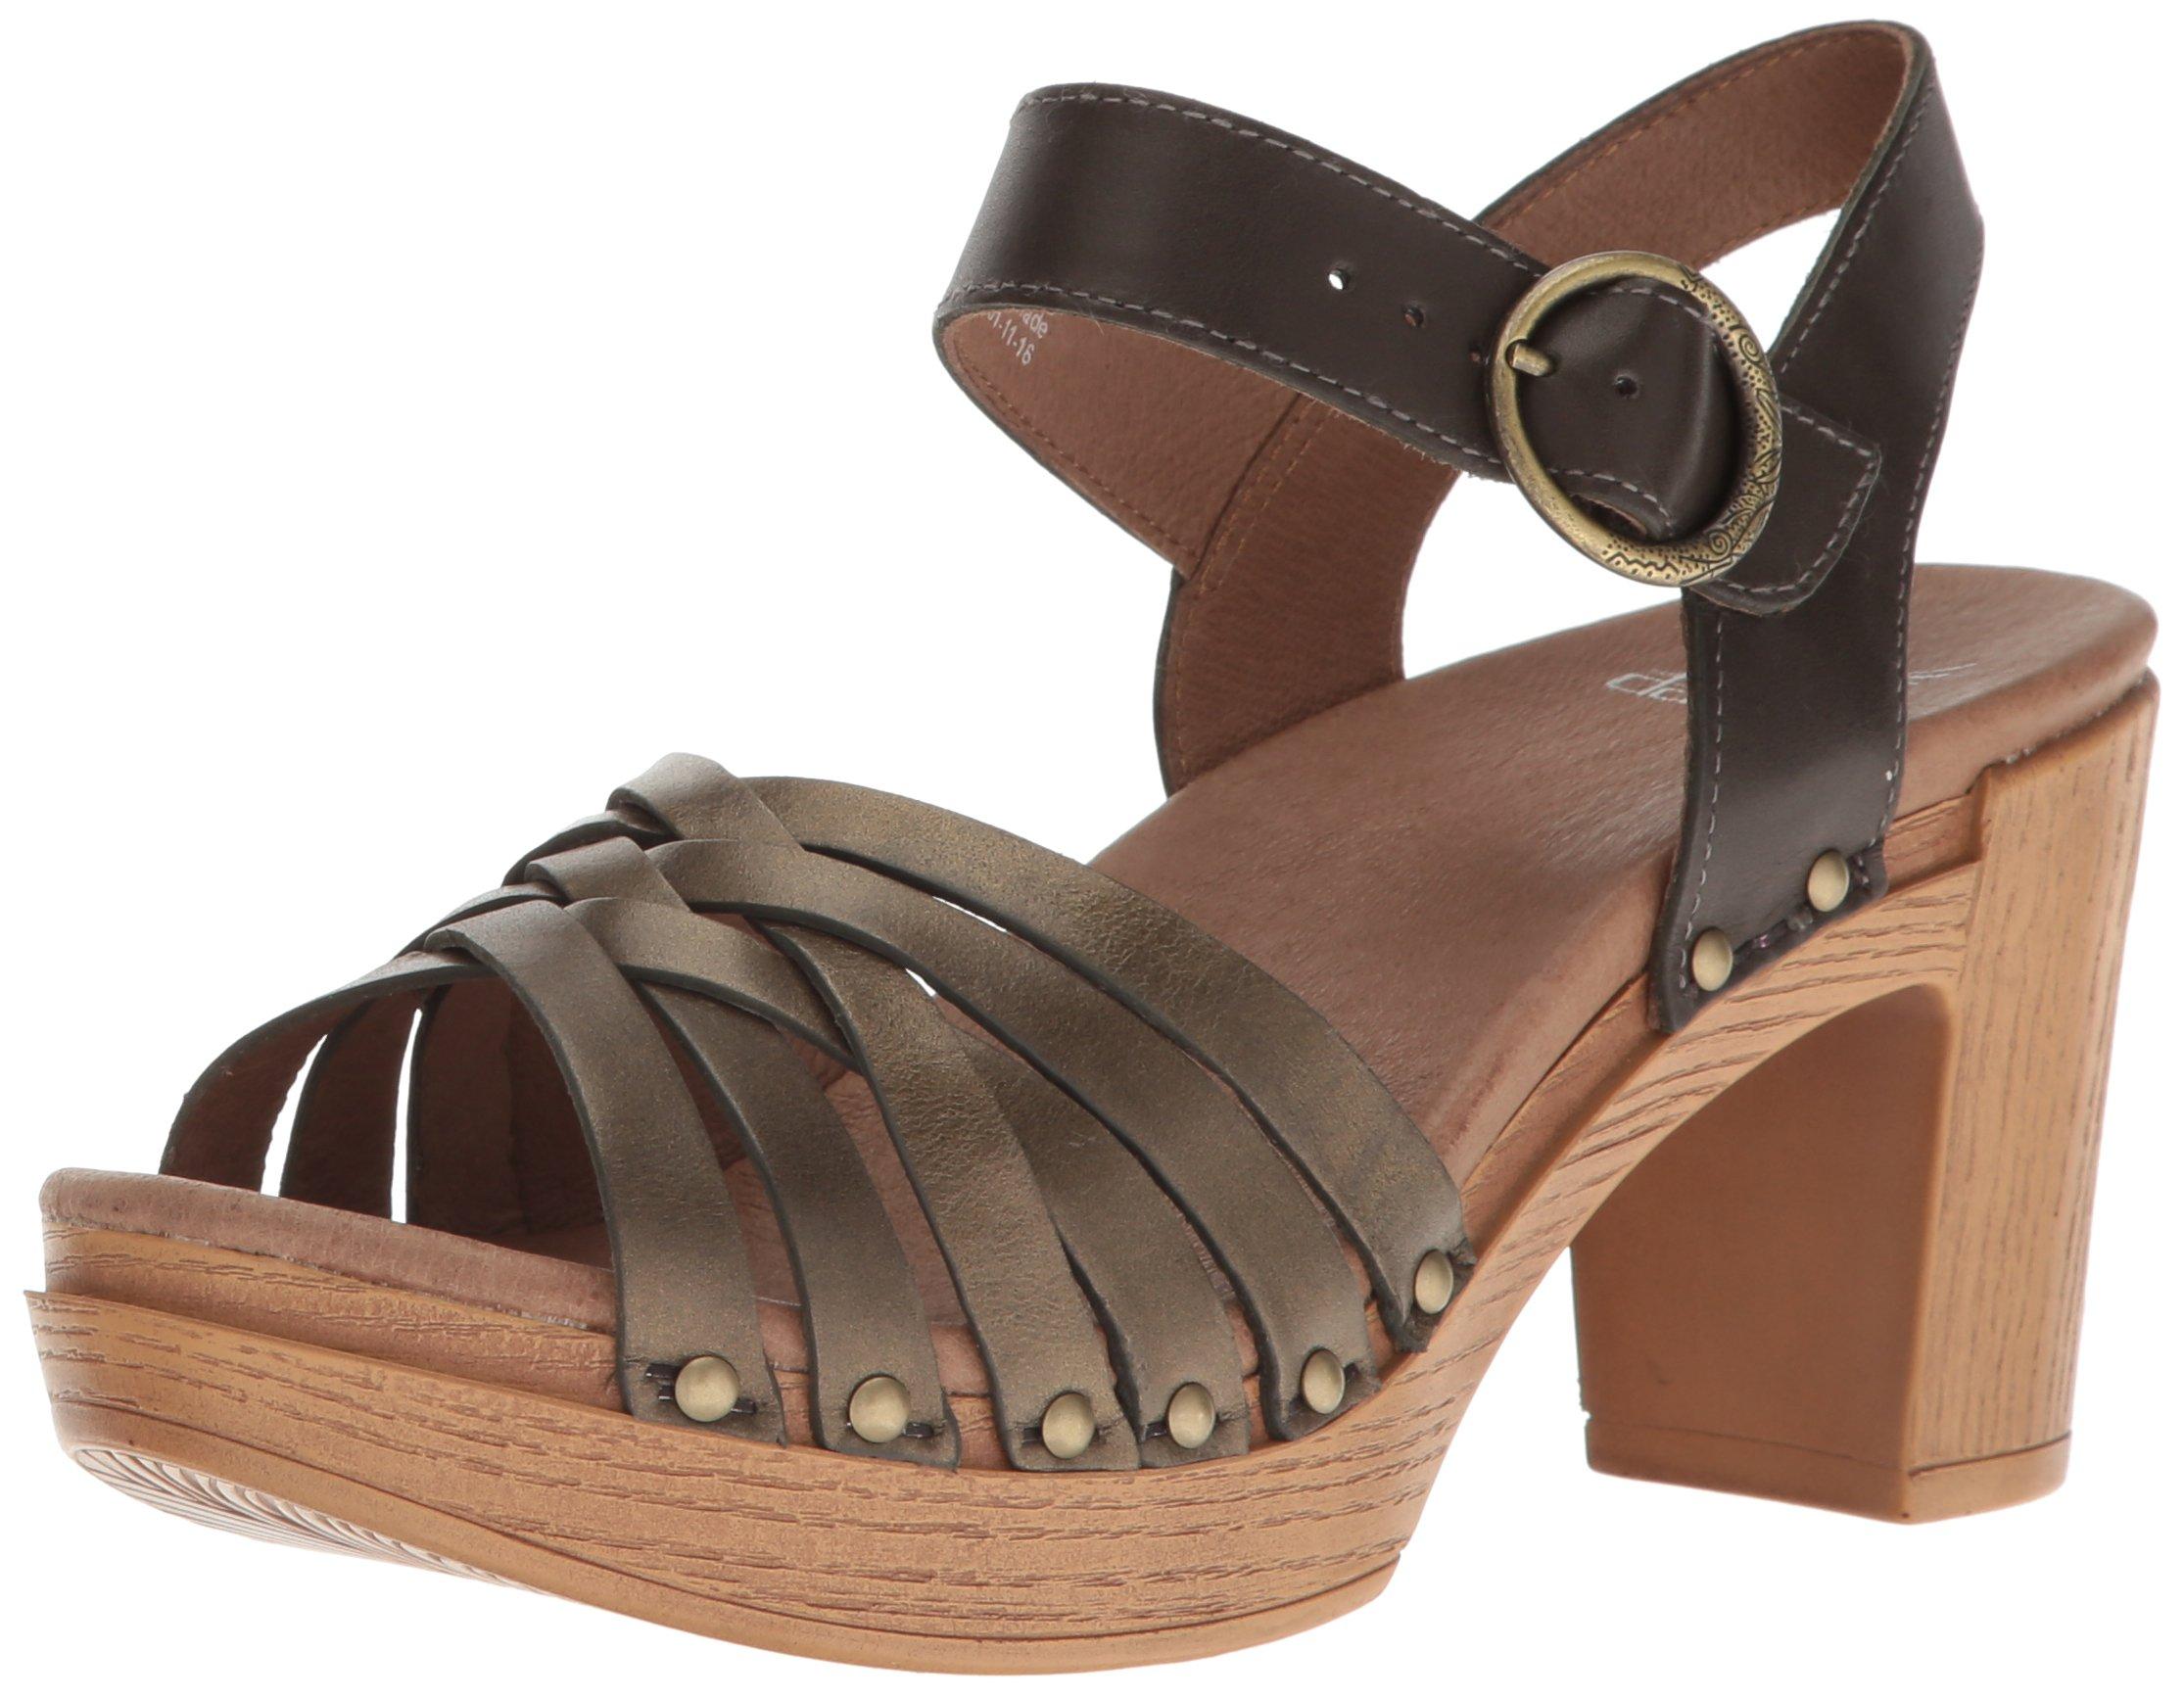 Dansko Women's Dawson Heeled Sandal, Old Gold/Metallic, 37 EU/6.5-7 M US